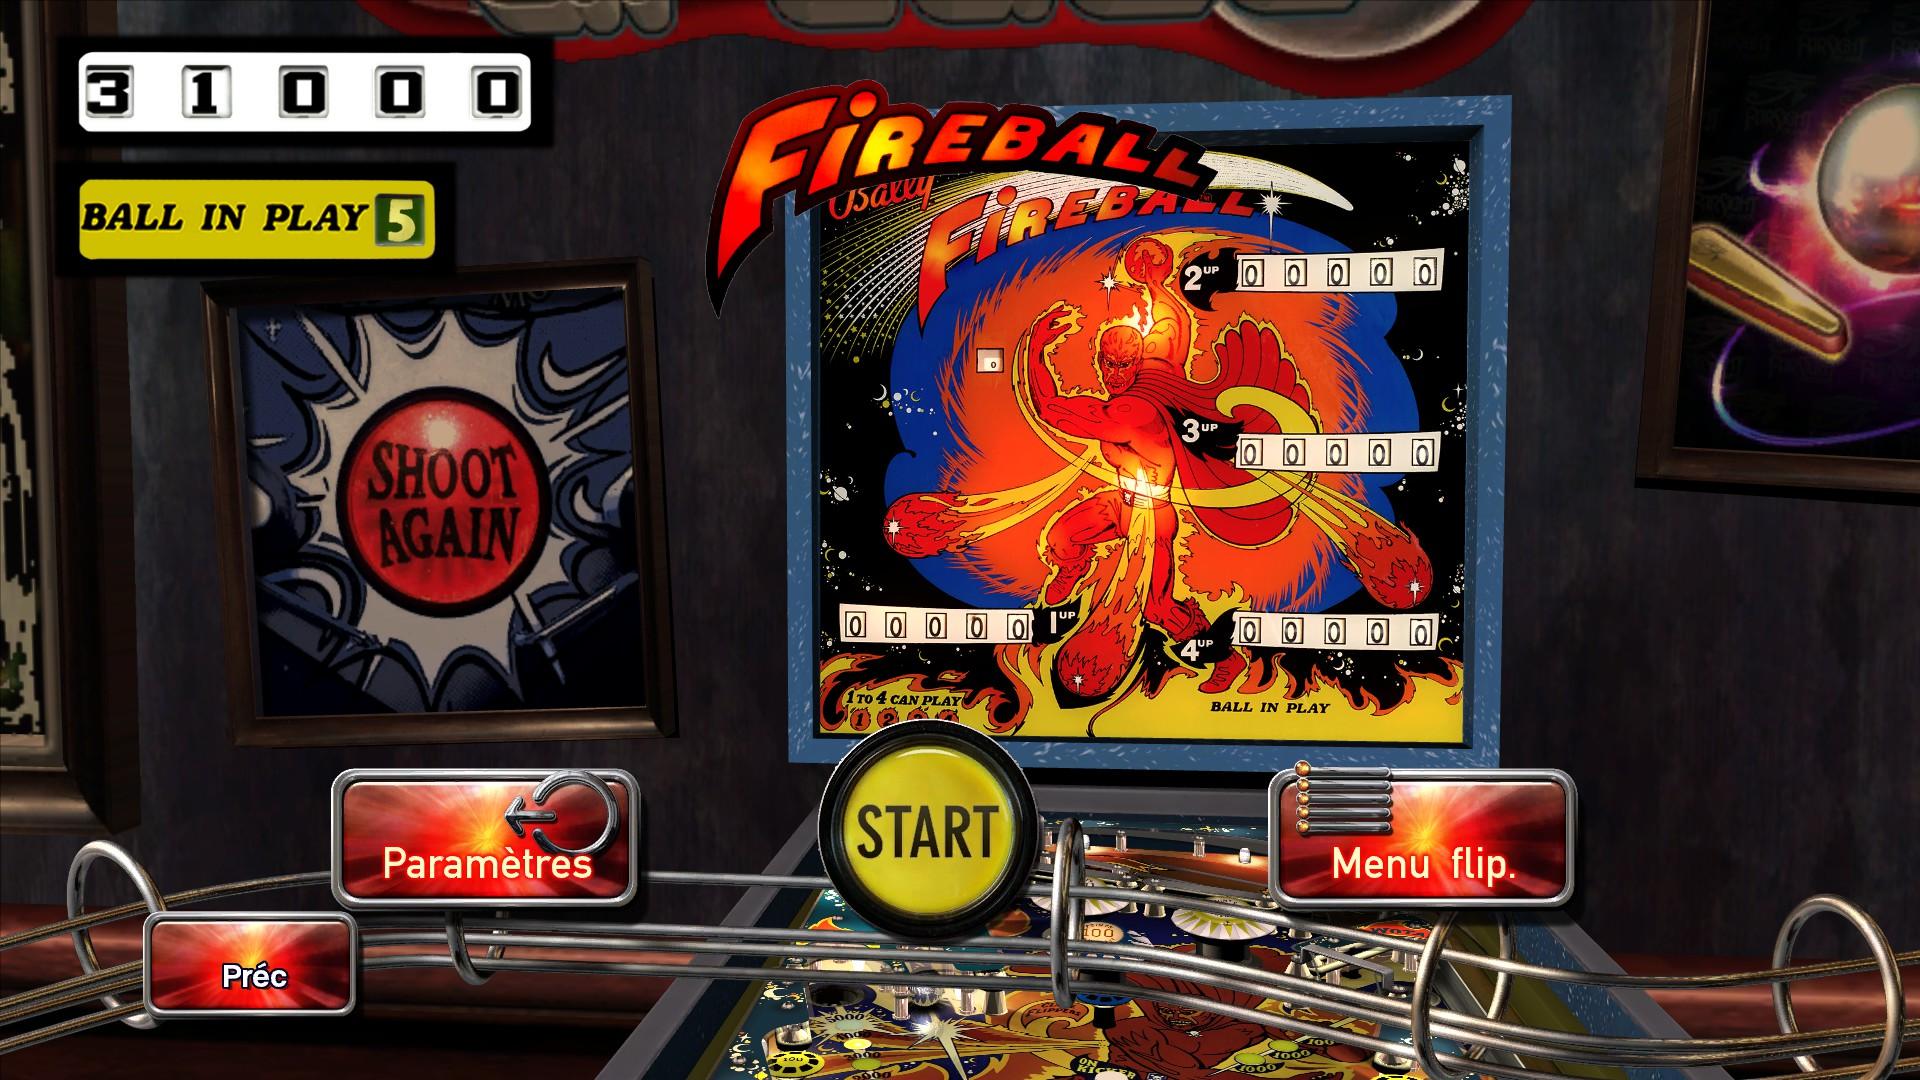 Mantalow: Pinball Arcade: Fireball (PC) 31,000 points on 2016-01-30 03:01:56